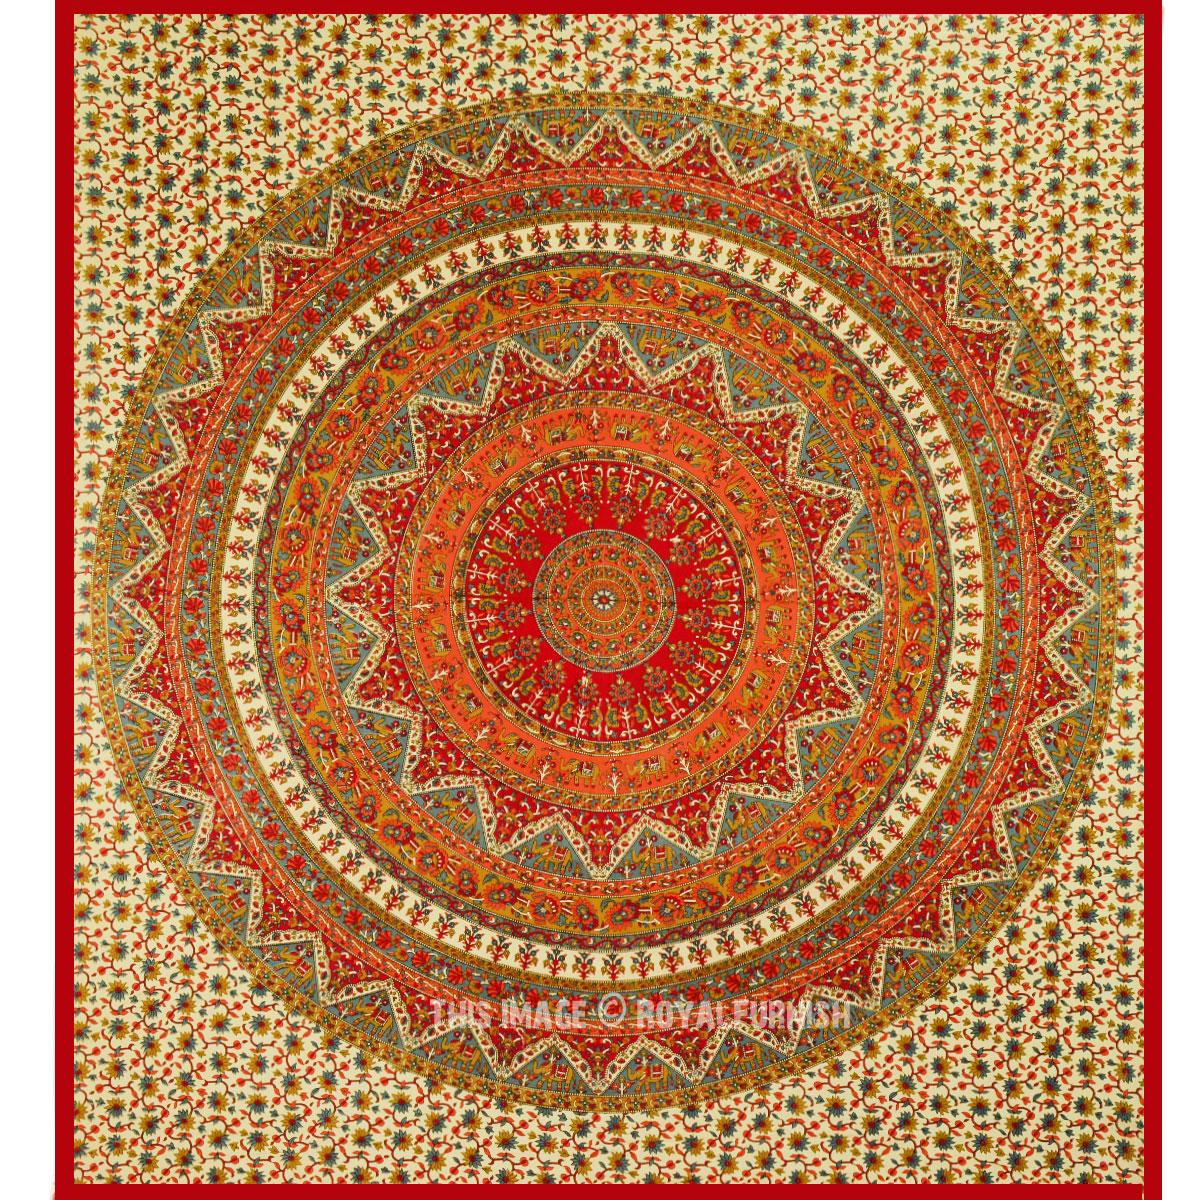 Red Bohemian Mandala Wall Tapestry, Kerala Hippie Bedding - RoyalFurnish.com